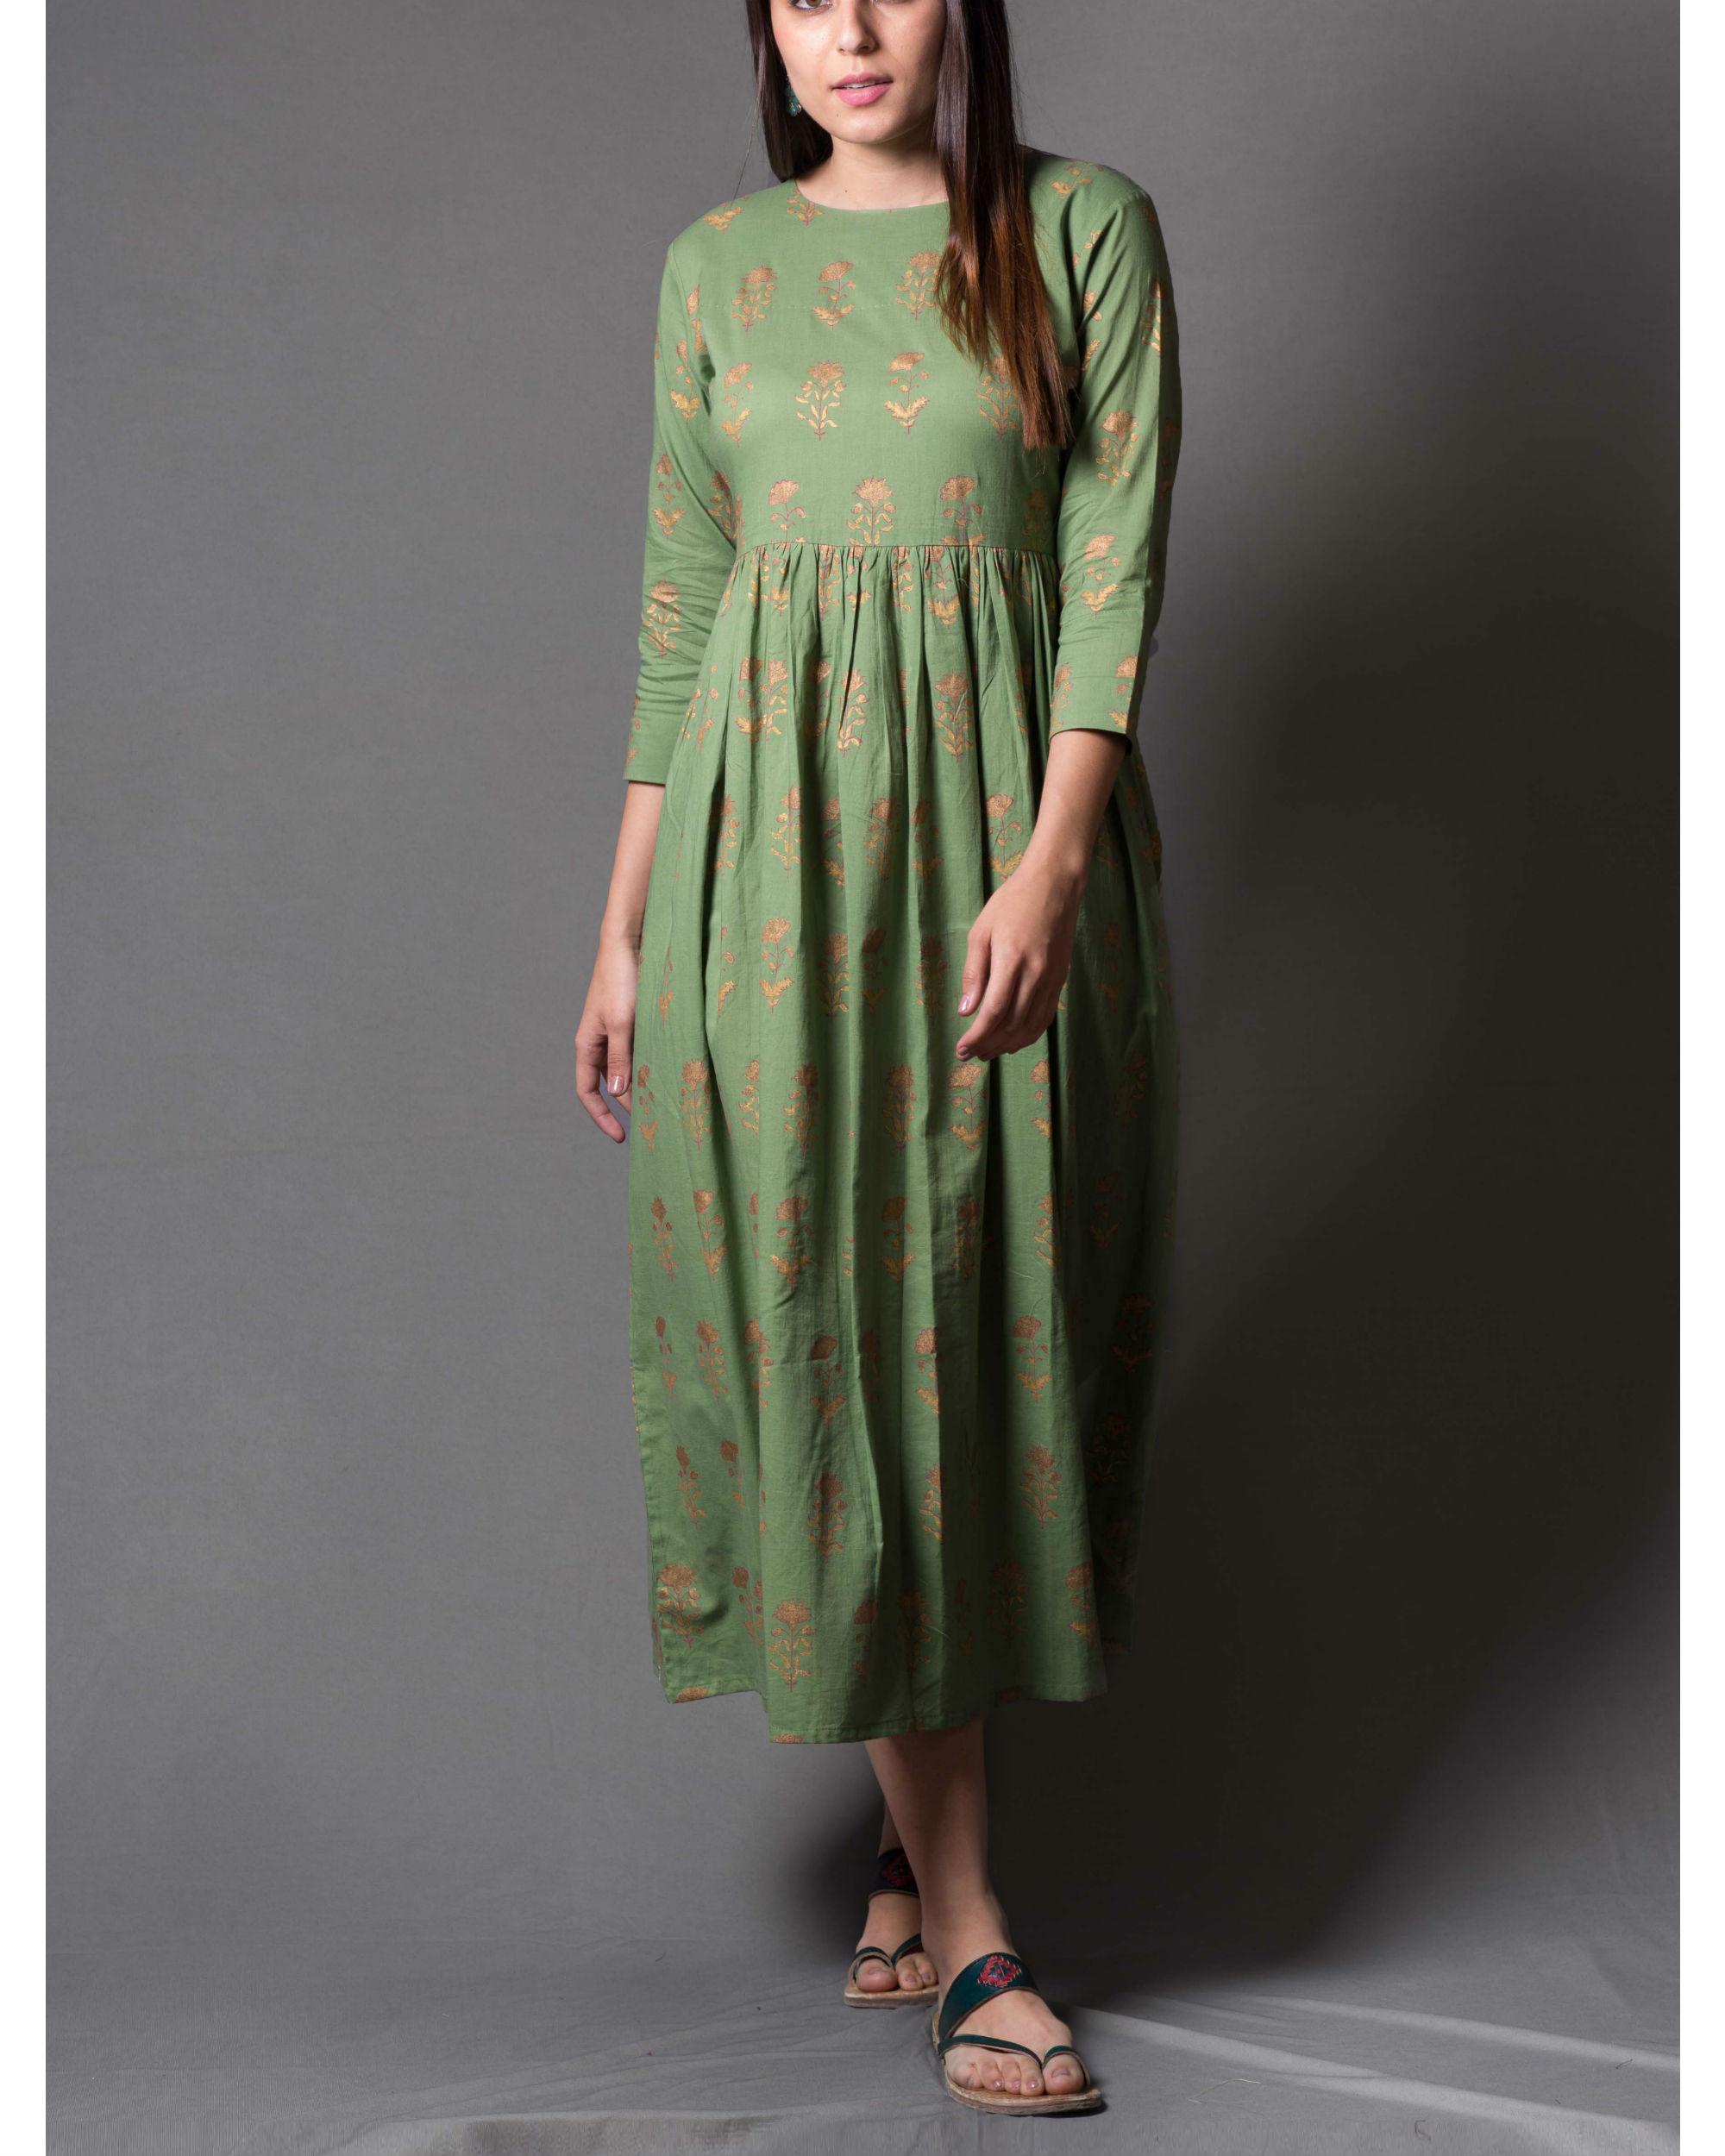 Green daisy block printed dress